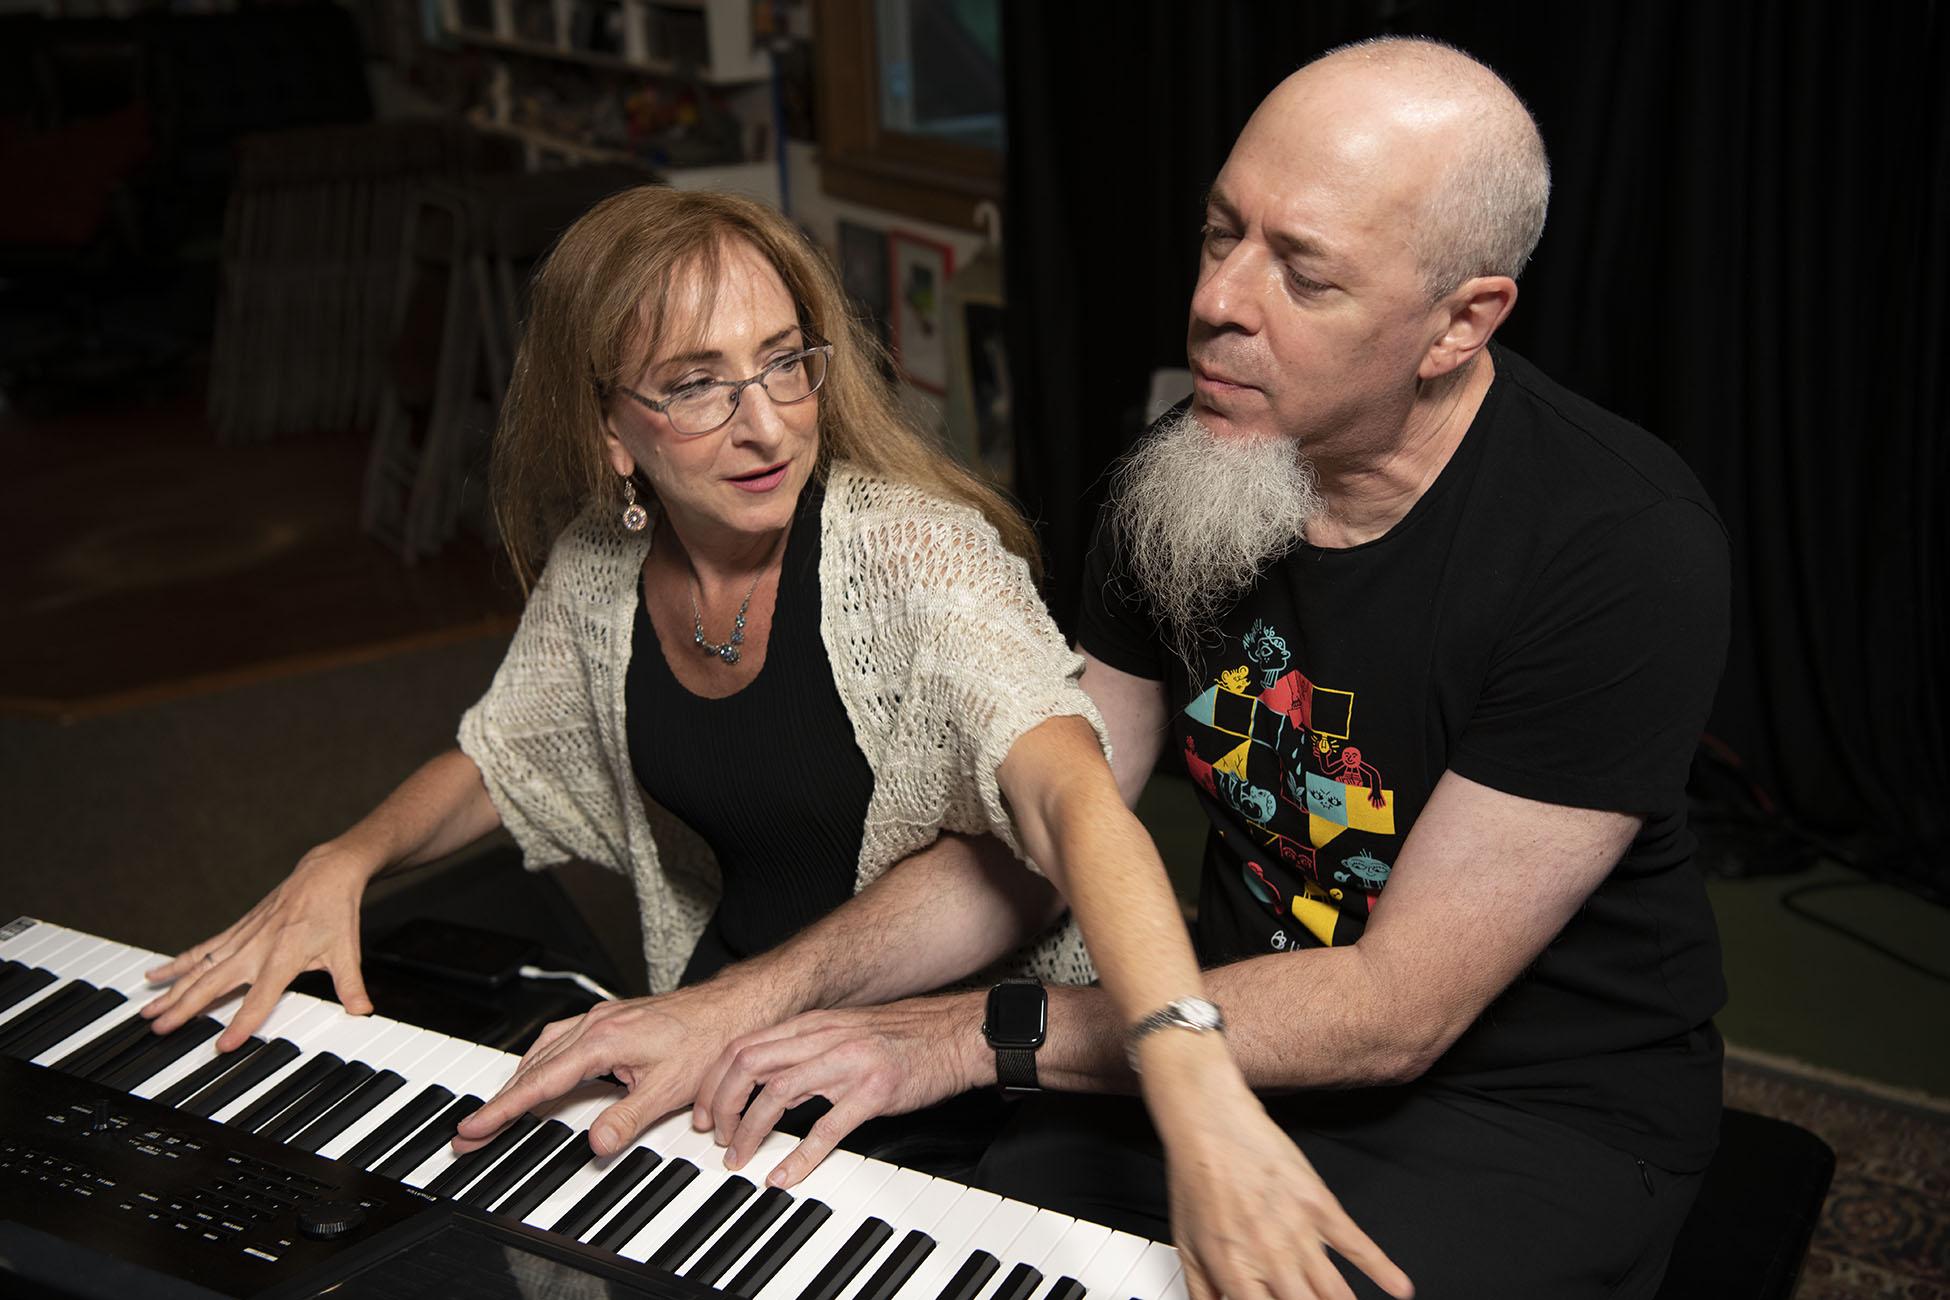 Jordan Rudess and Judith Stillman at the LoFaro Center of the Performing Arts, August 17, 2019